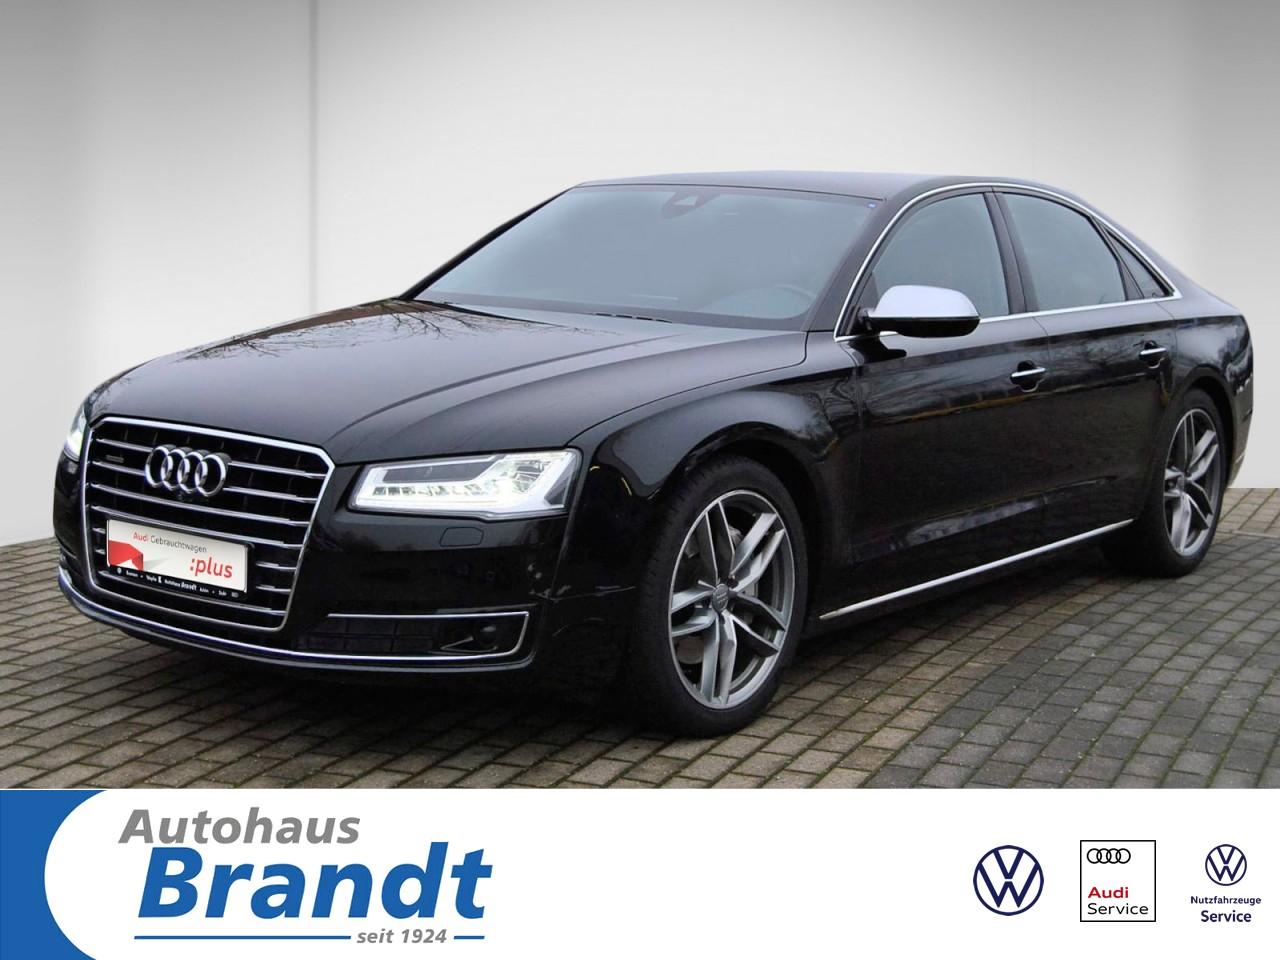 Audi A8 3.0 TDI quattro MATRIX*LEDER*STANDH*KAMERA, Jahr 2016, Diesel